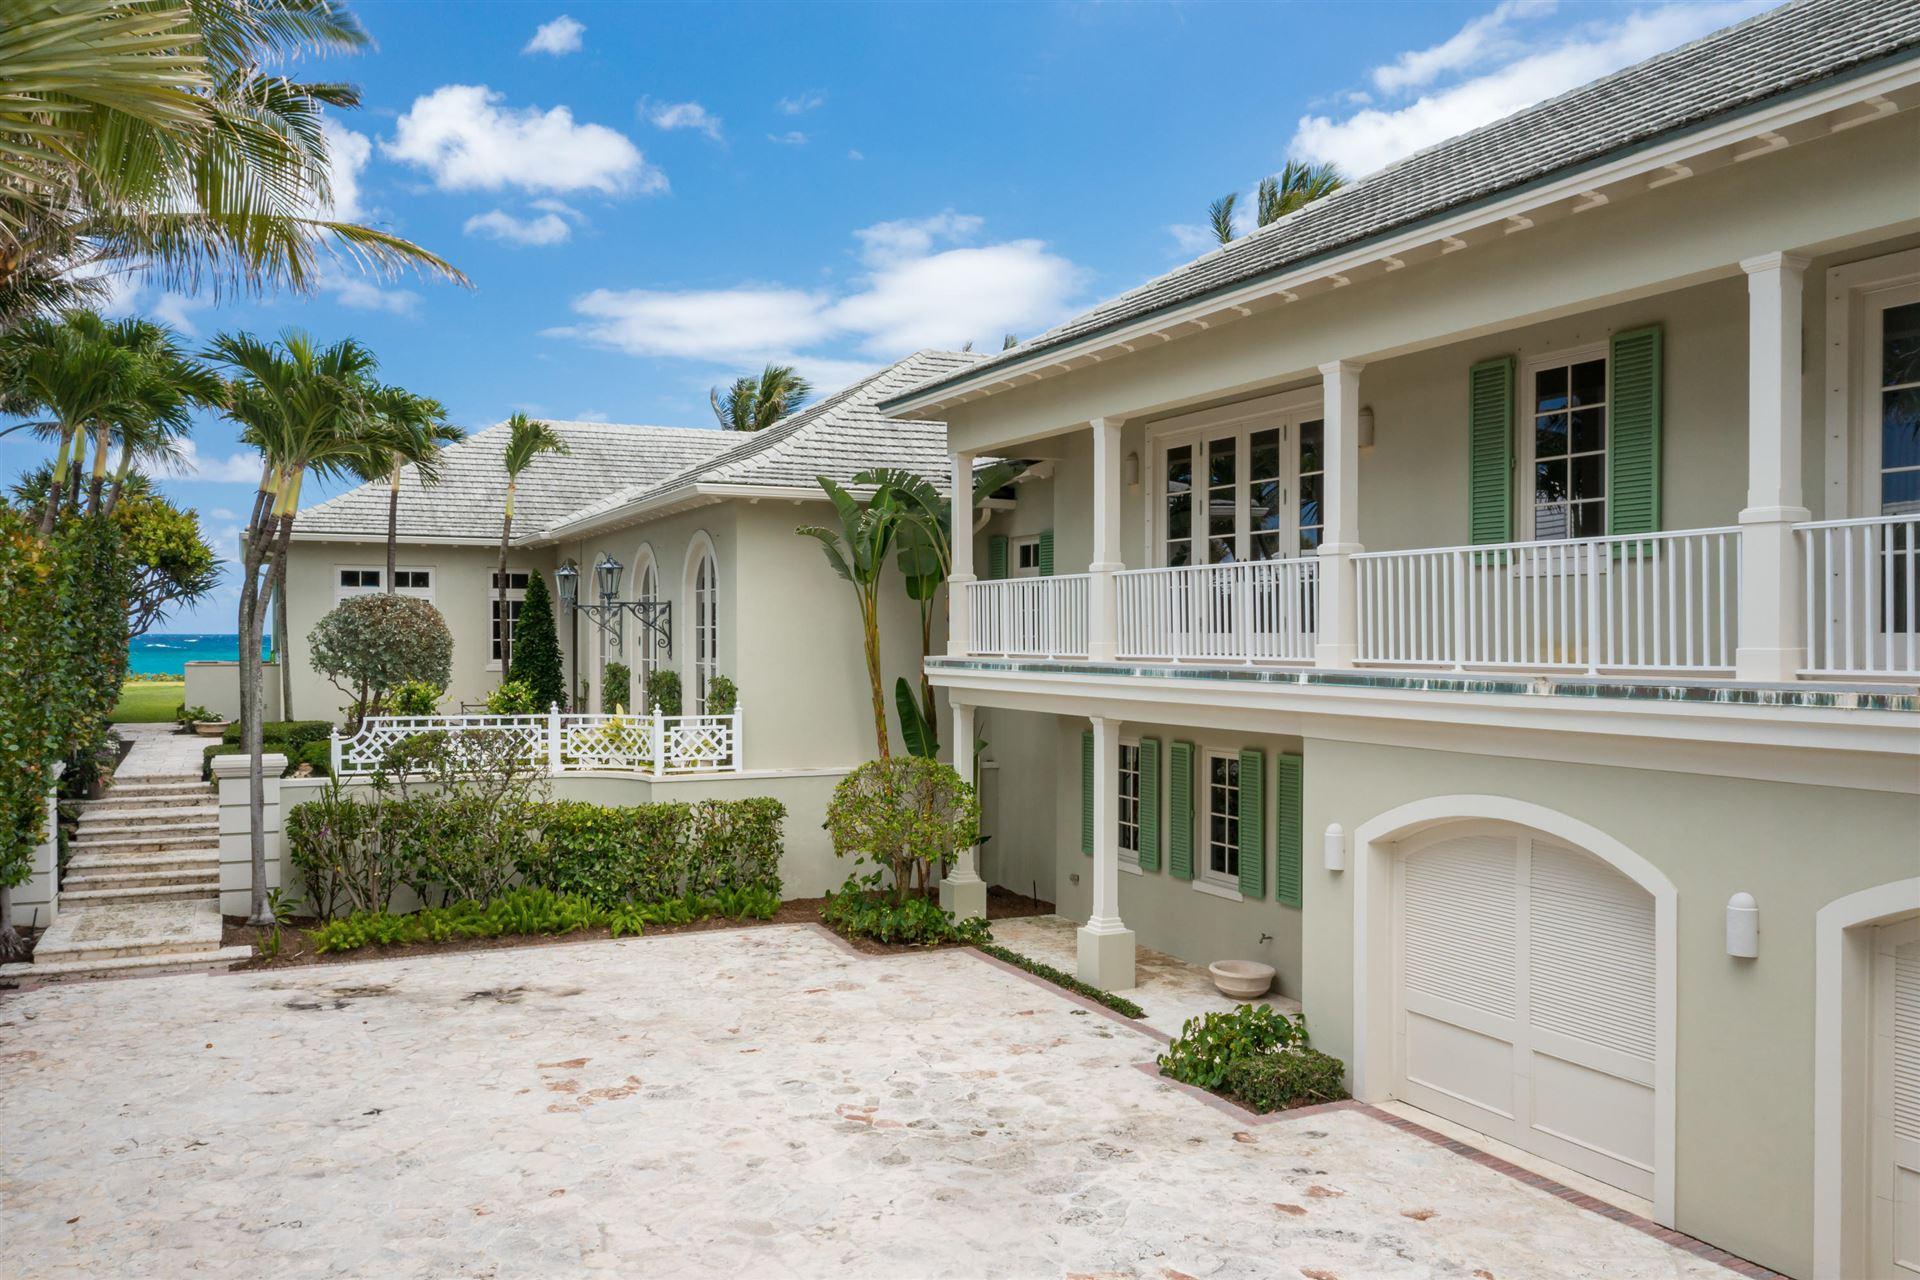 Photo of 11432 Turtle Beach Road, North Palm Beach, FL 33408 (MLS # RX-10723577)